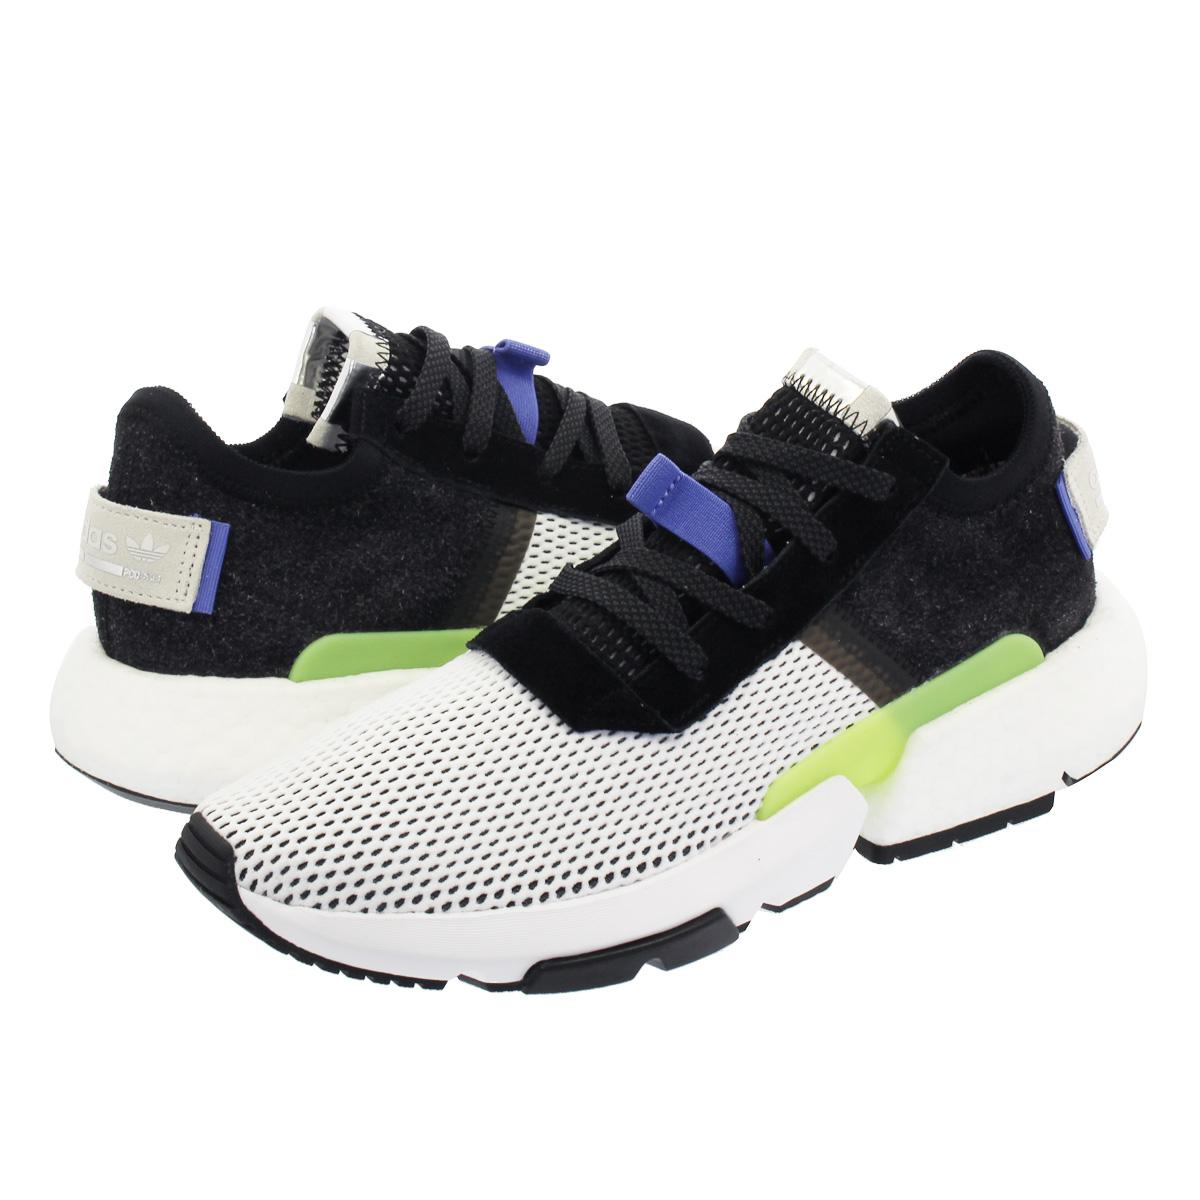 adidas POD S3.1 Adidas POD S3.1 CORE BLACKREAL LILACSHOCK RED cg5947